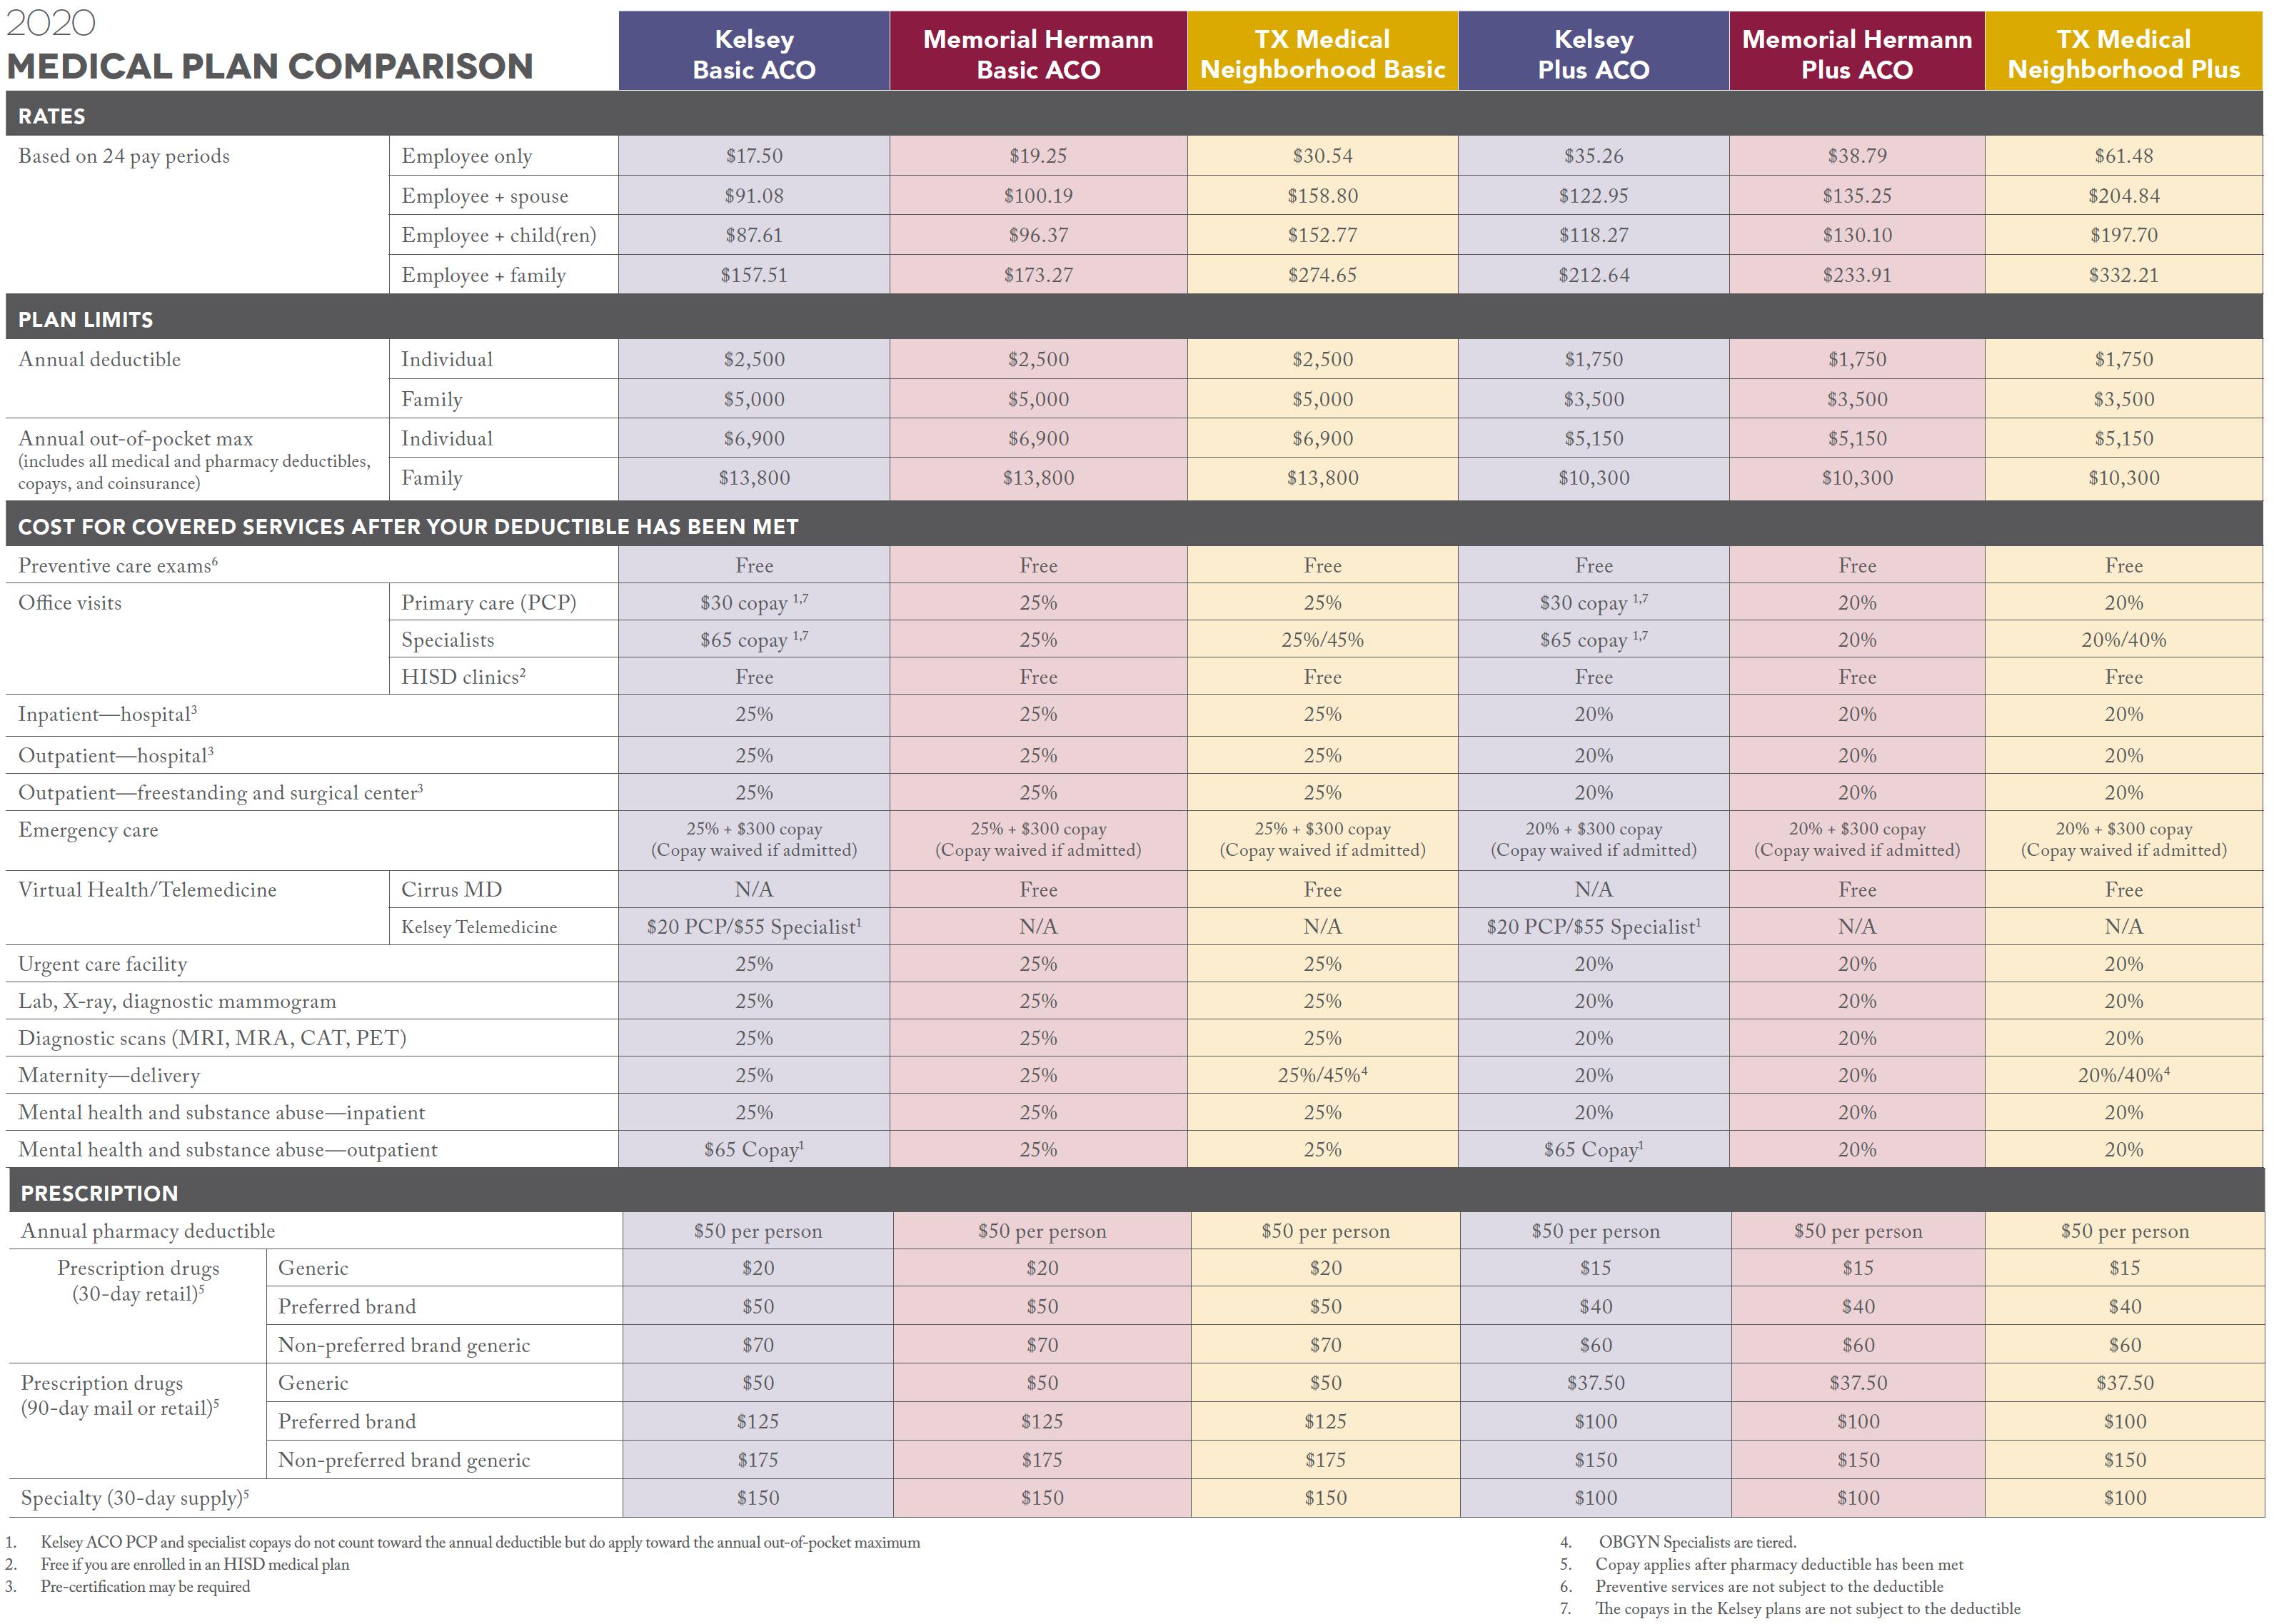 2020 Medical Plan Comparison